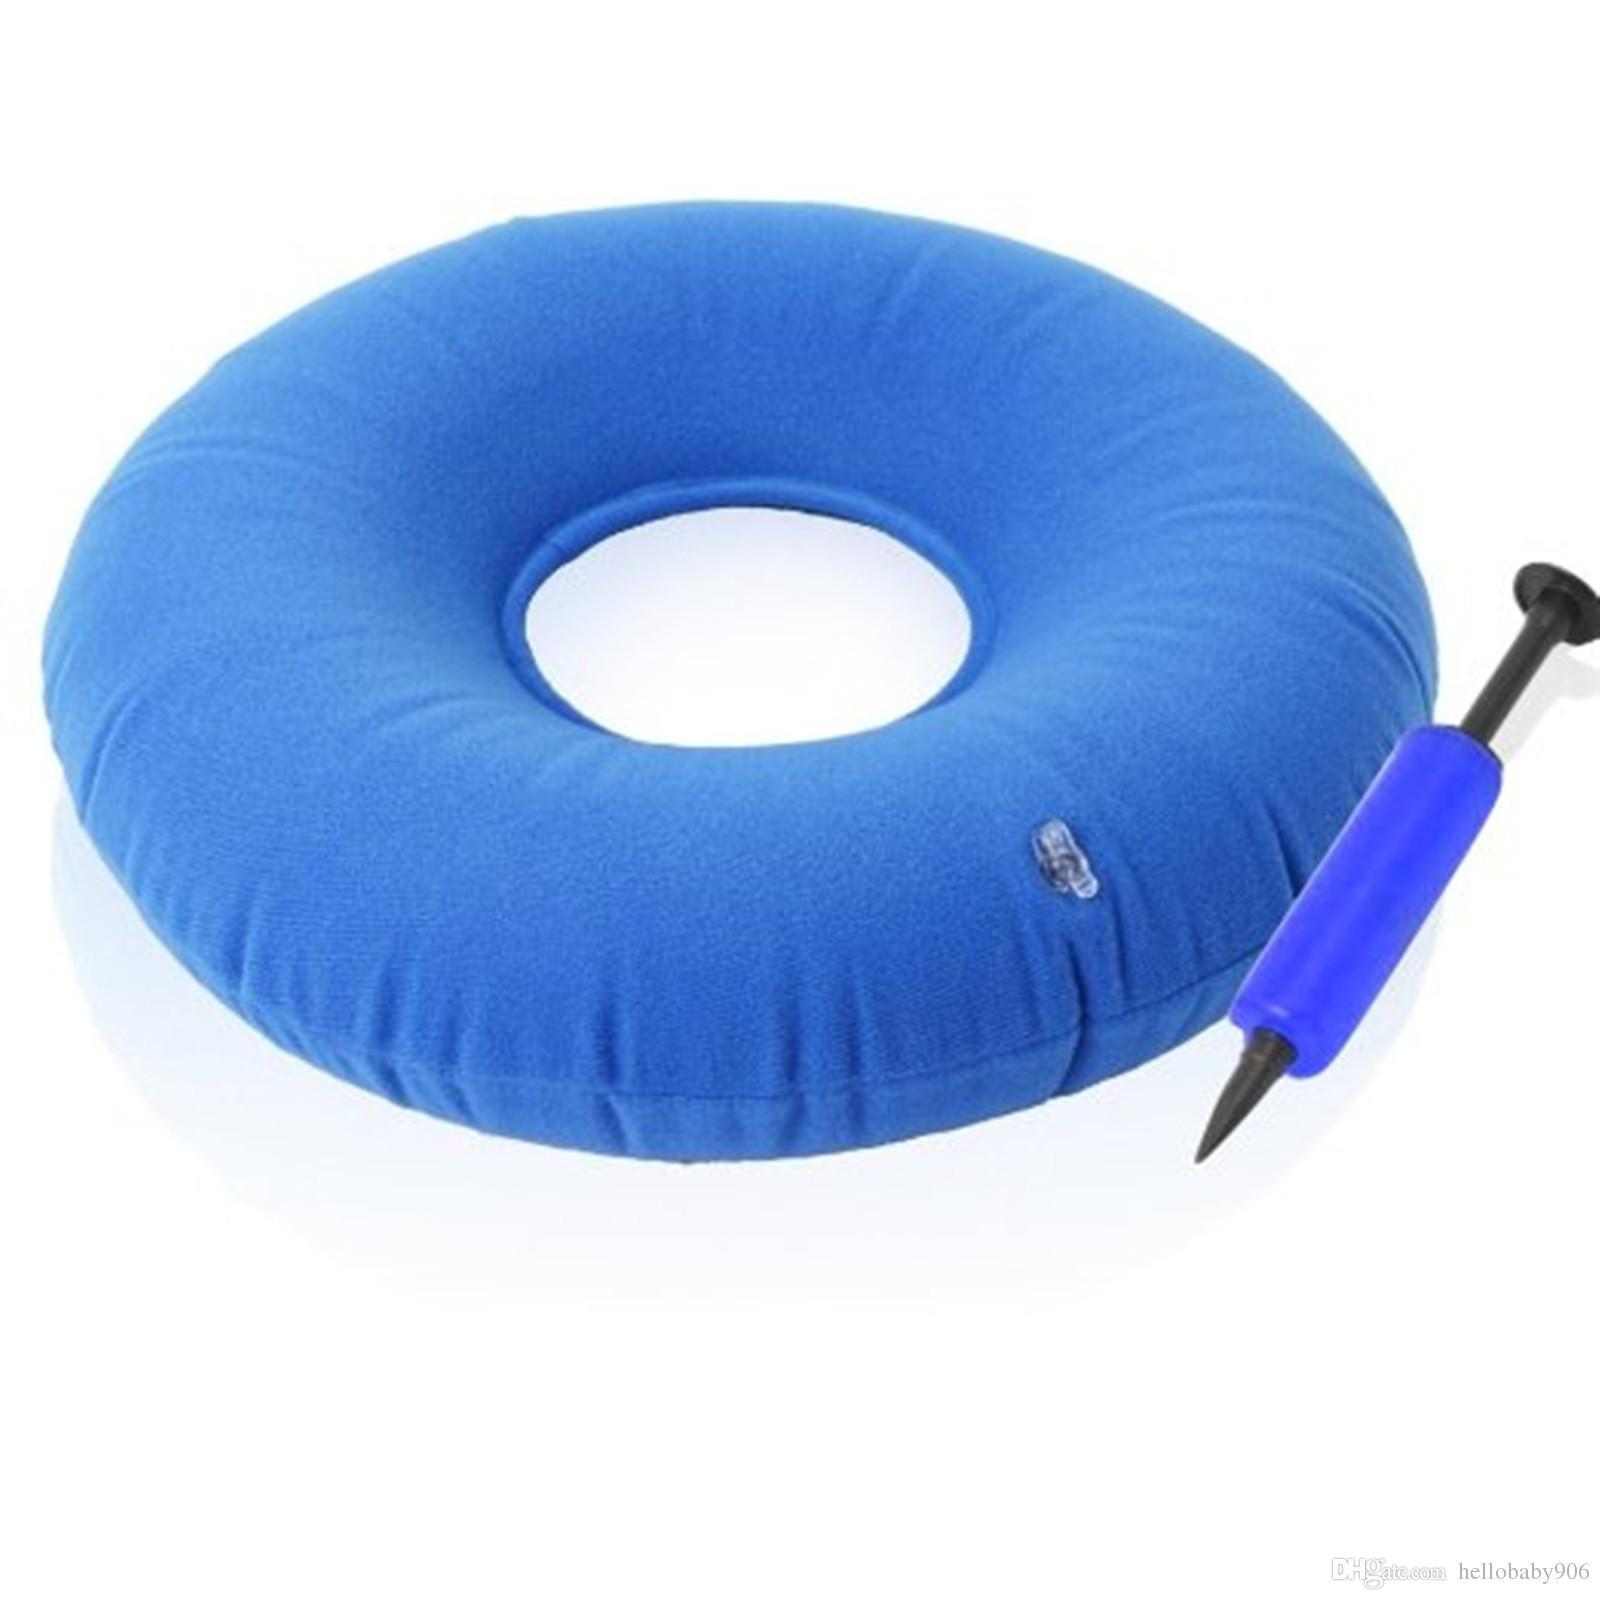 wheelchair cushion types hammock chair stand australia 15 inflatable hemorrhoid seat pump blue donut